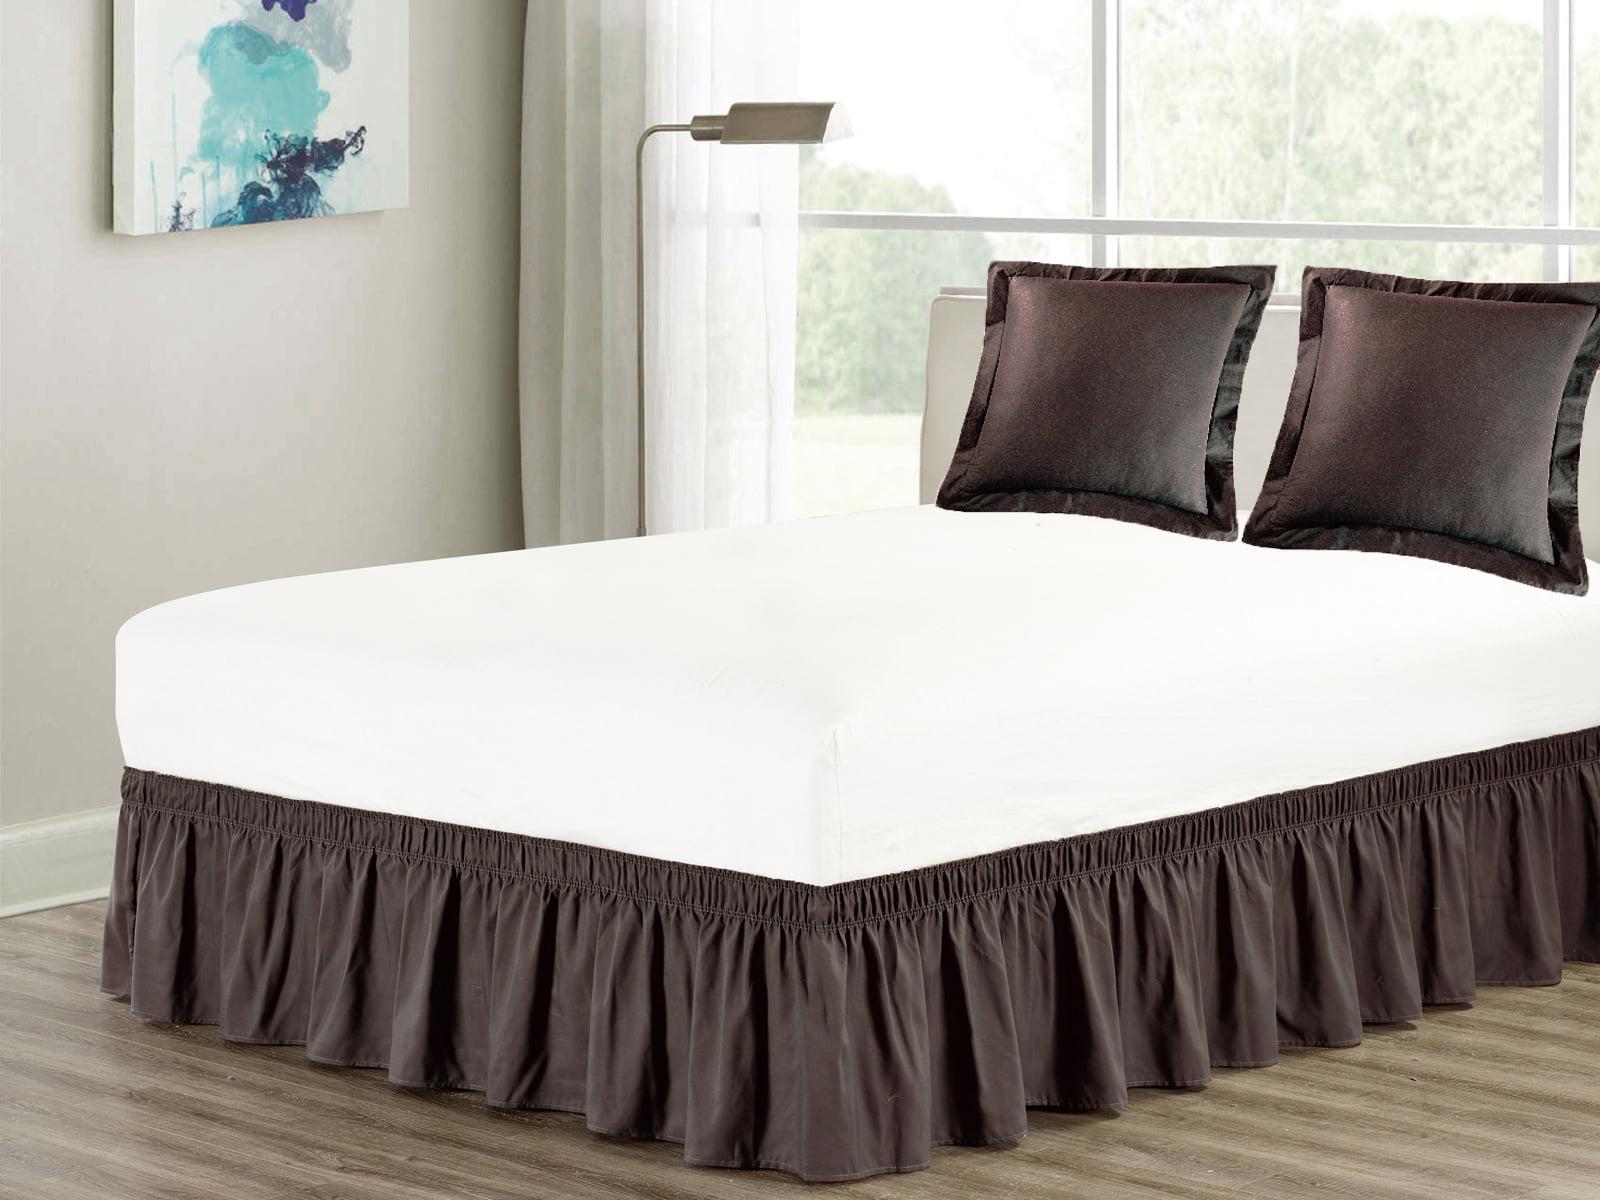 3 Piece Matching Ruffled Bed Skirt Euro Pillow Sham Pair Set King Elastic Wraparound Brown Coffee Chocolate Walmart Com Walmart Com